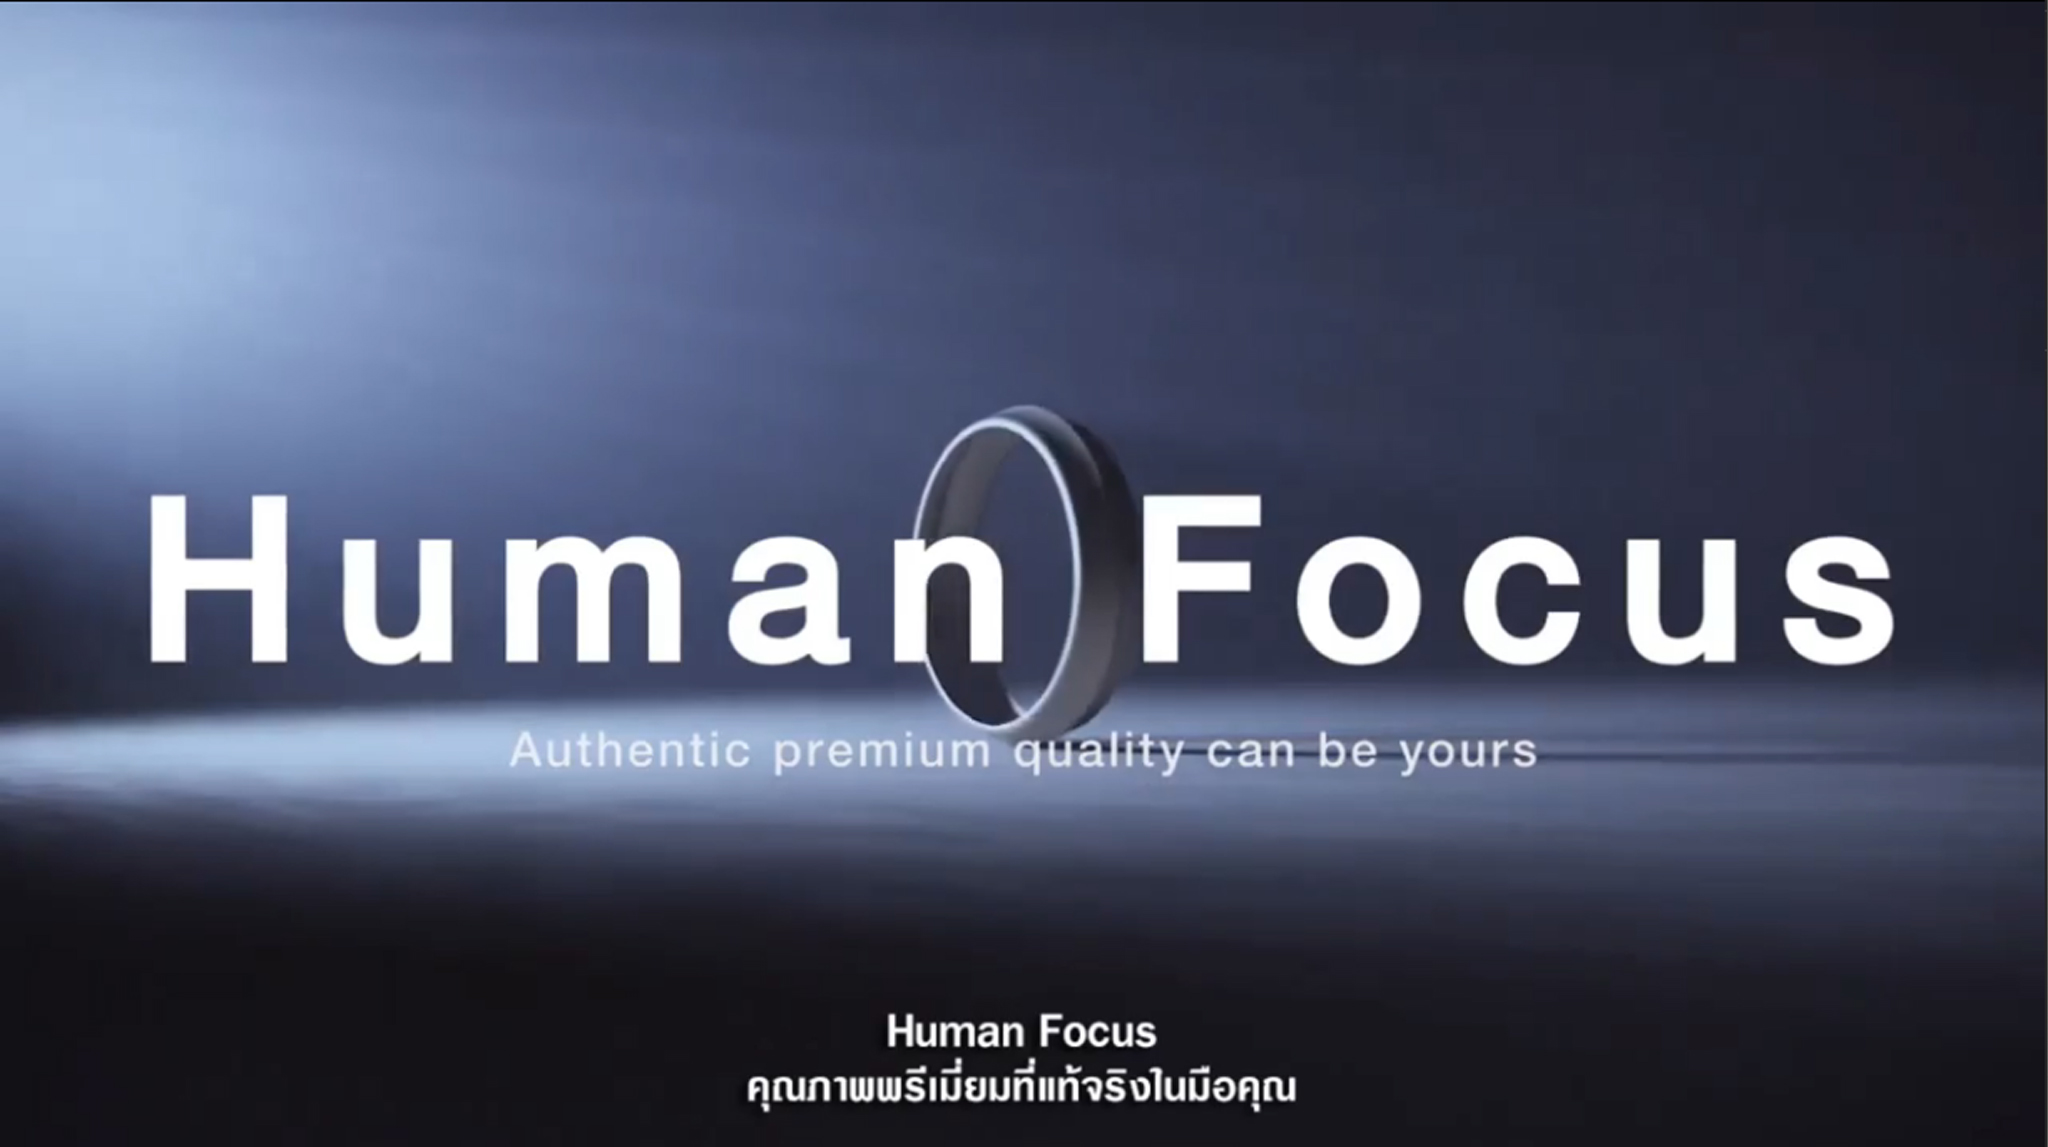 TAMRON HUMAN FOCUS